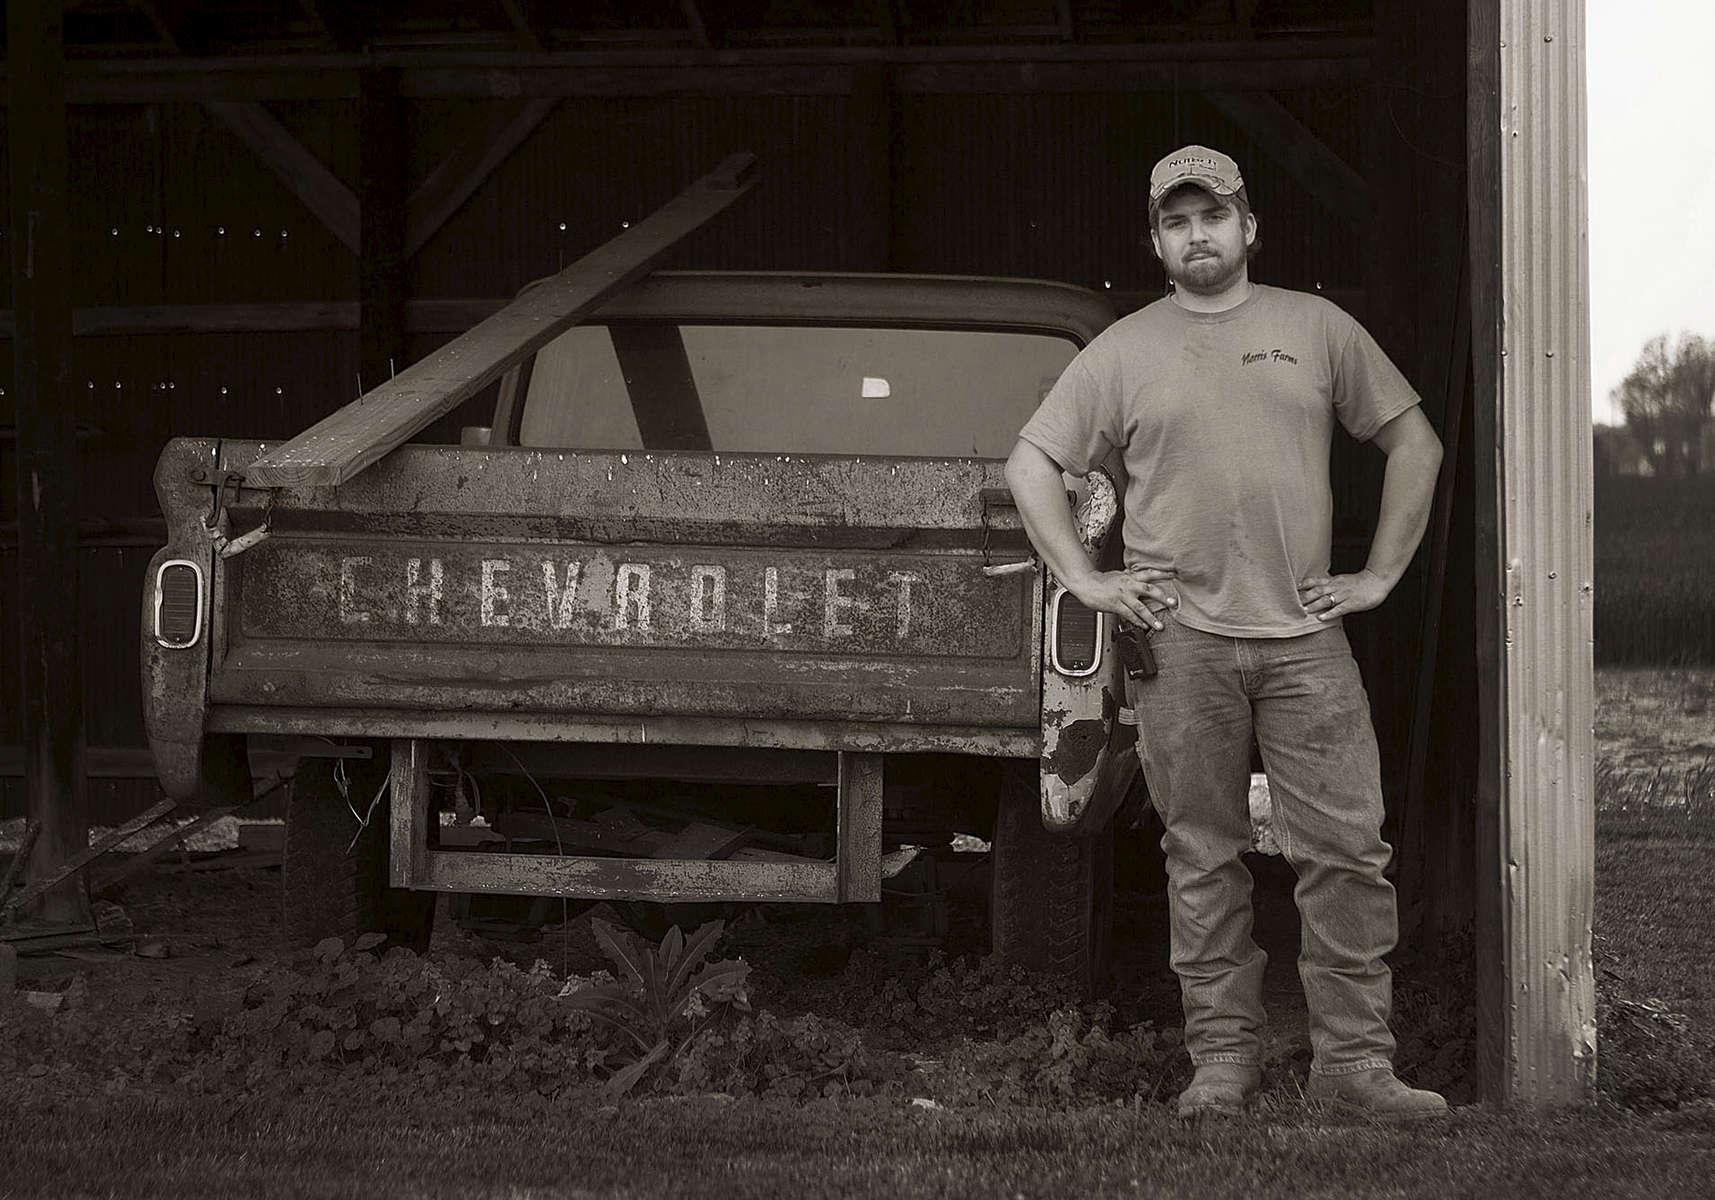 Indiana Farmer